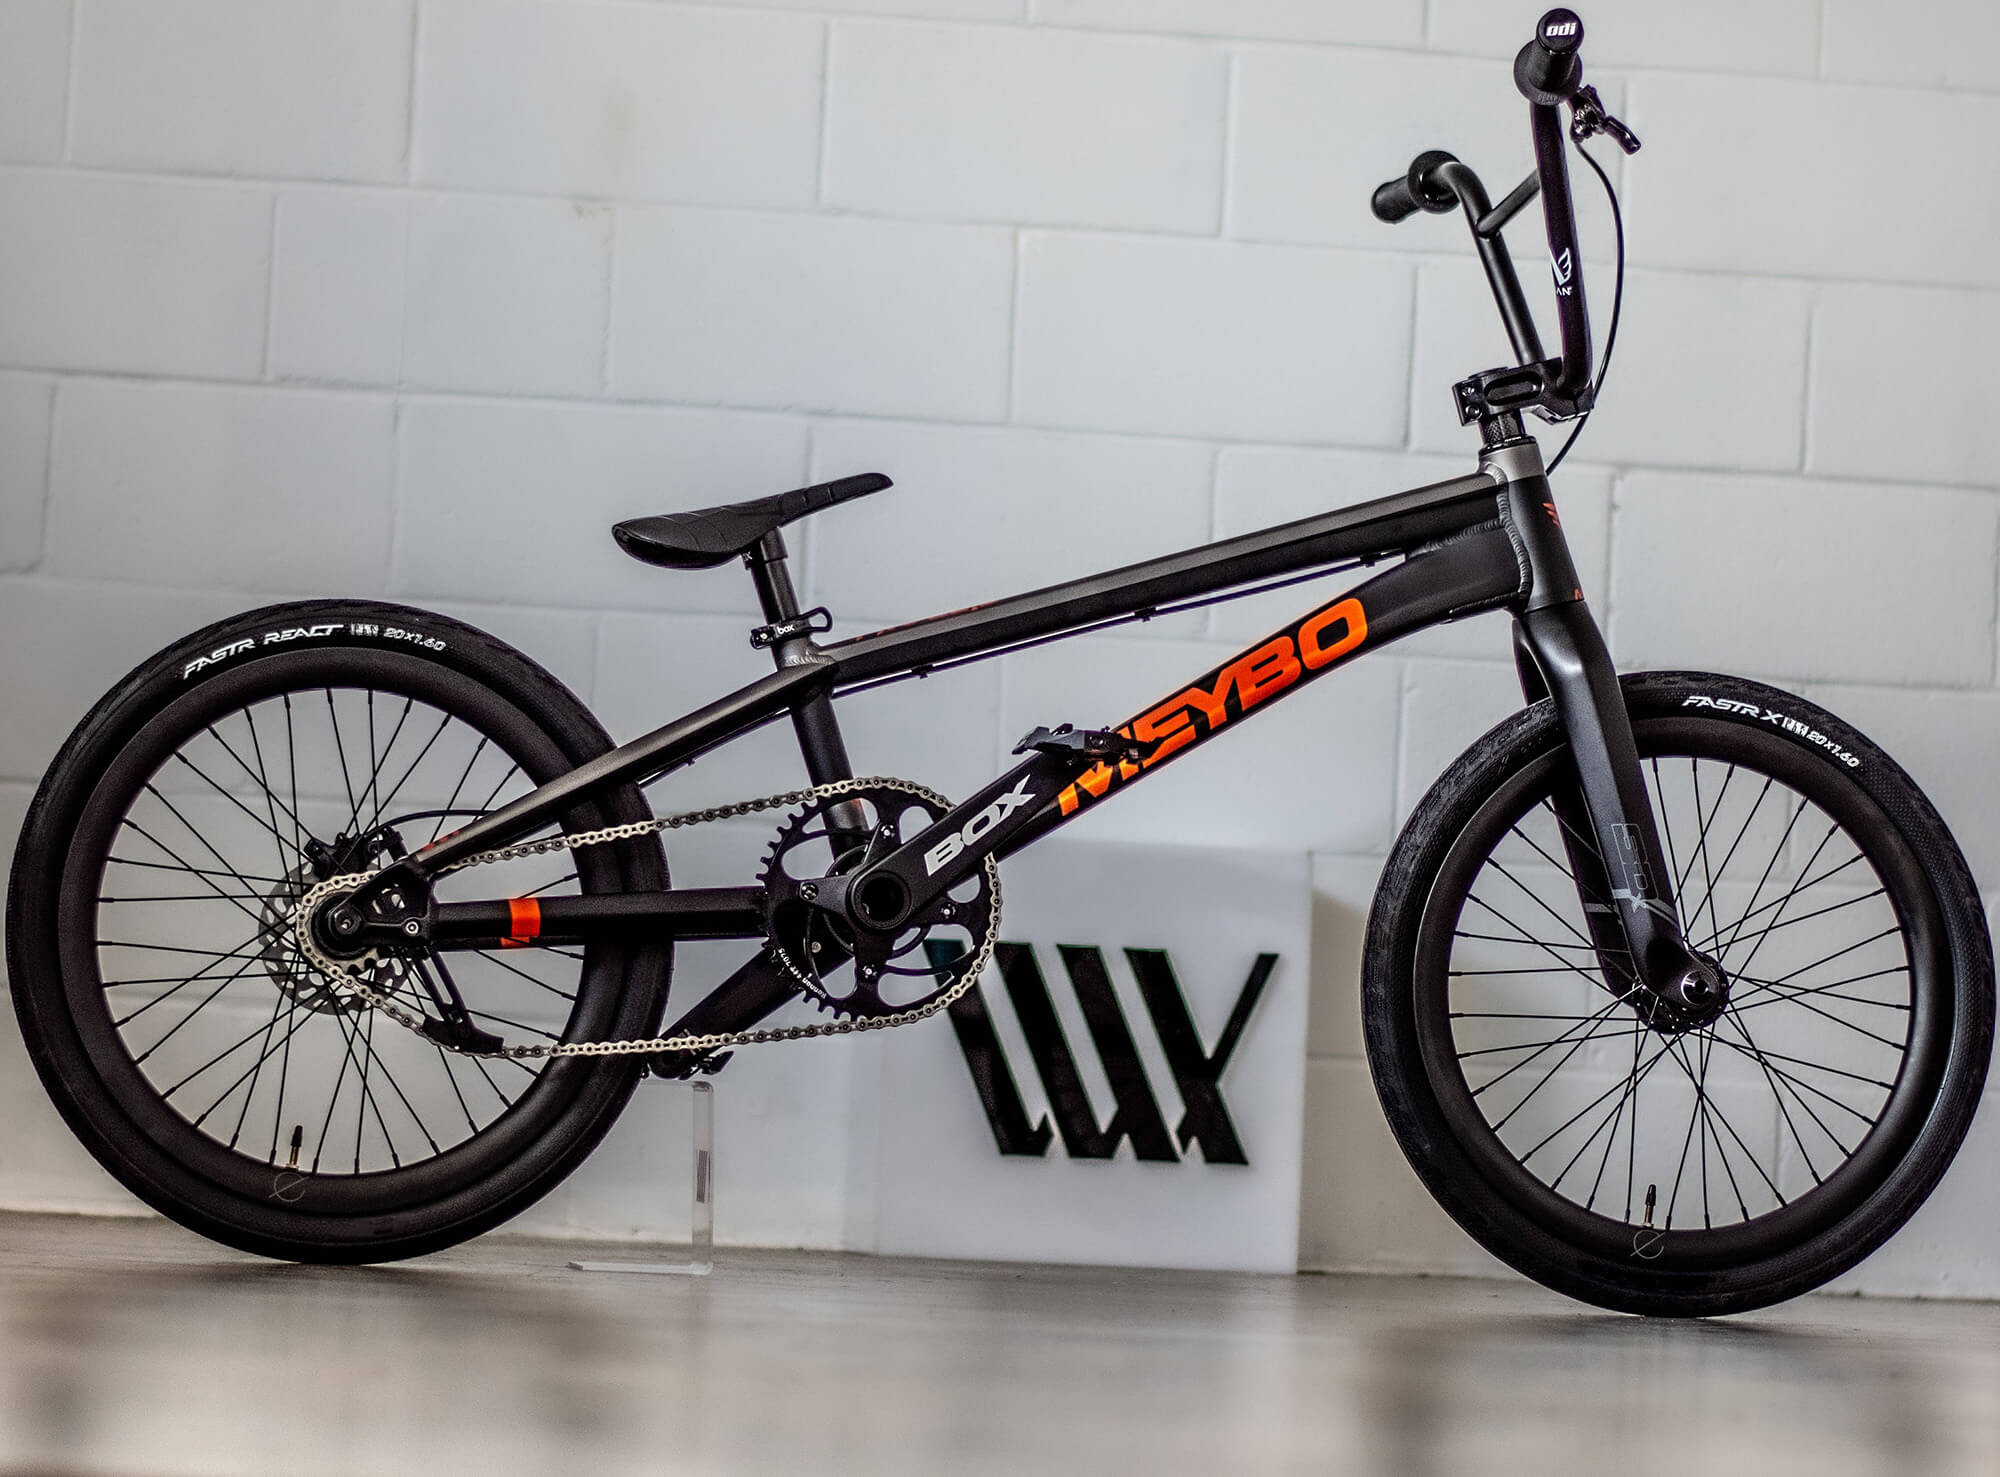 Lux BMX Meybo - Bruce Morris